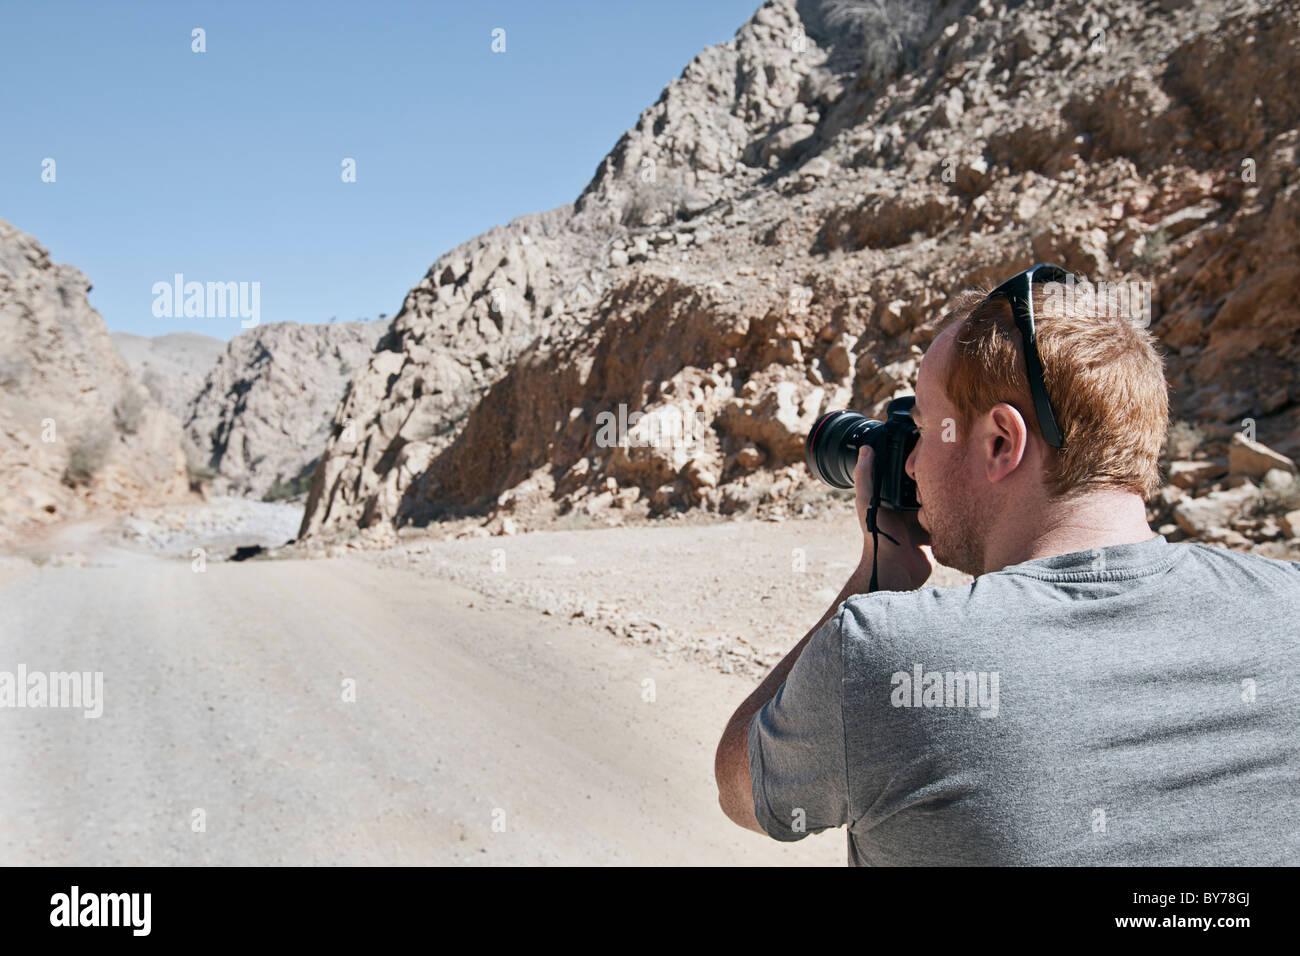 Tourist taking Photograph in Wadi Bih, Oman - Stock Image